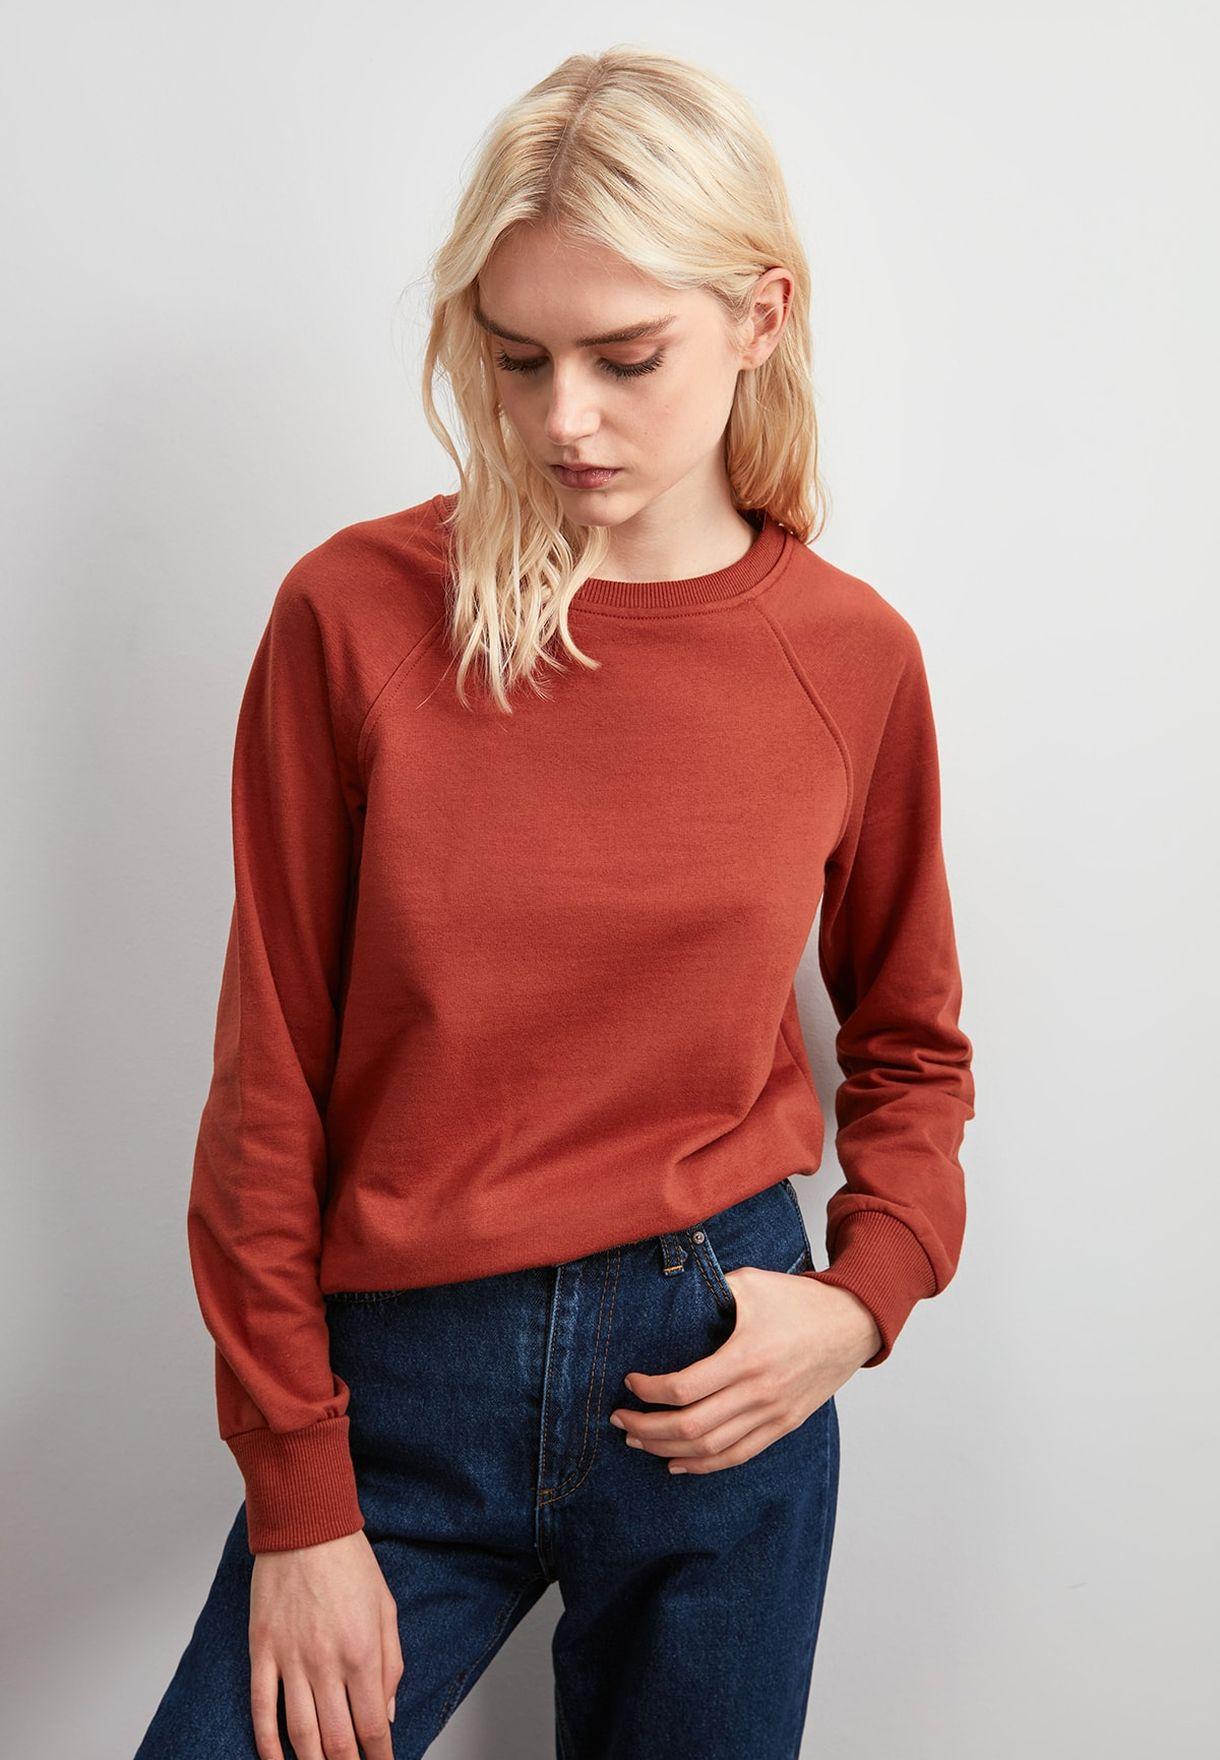 Seam Detail Sweatshirt